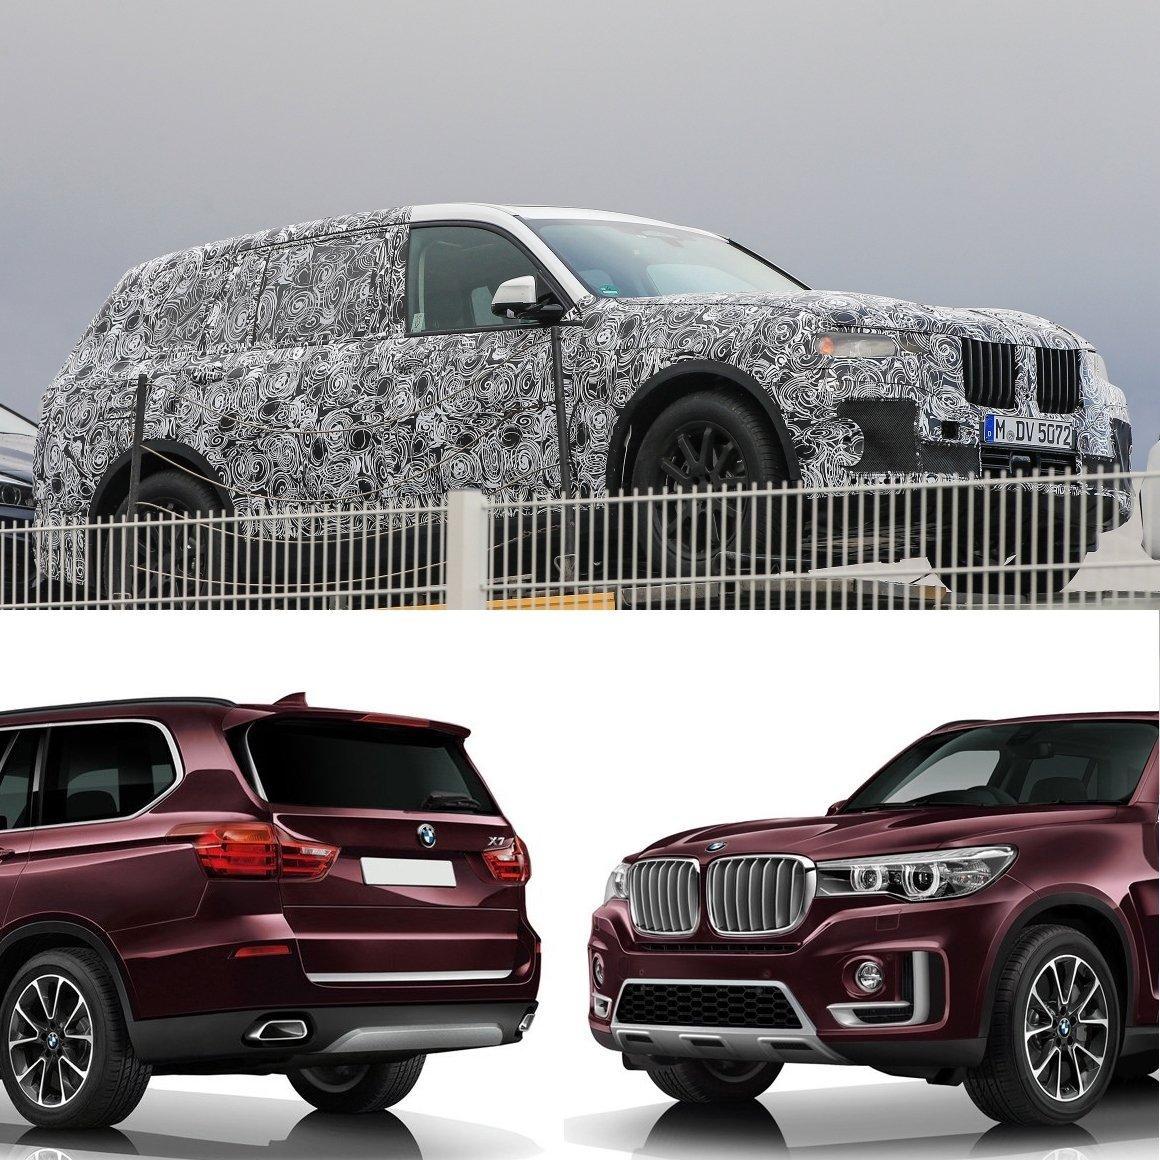 Bmw X7 M Series: BMW X7 рассекретили до премьеры